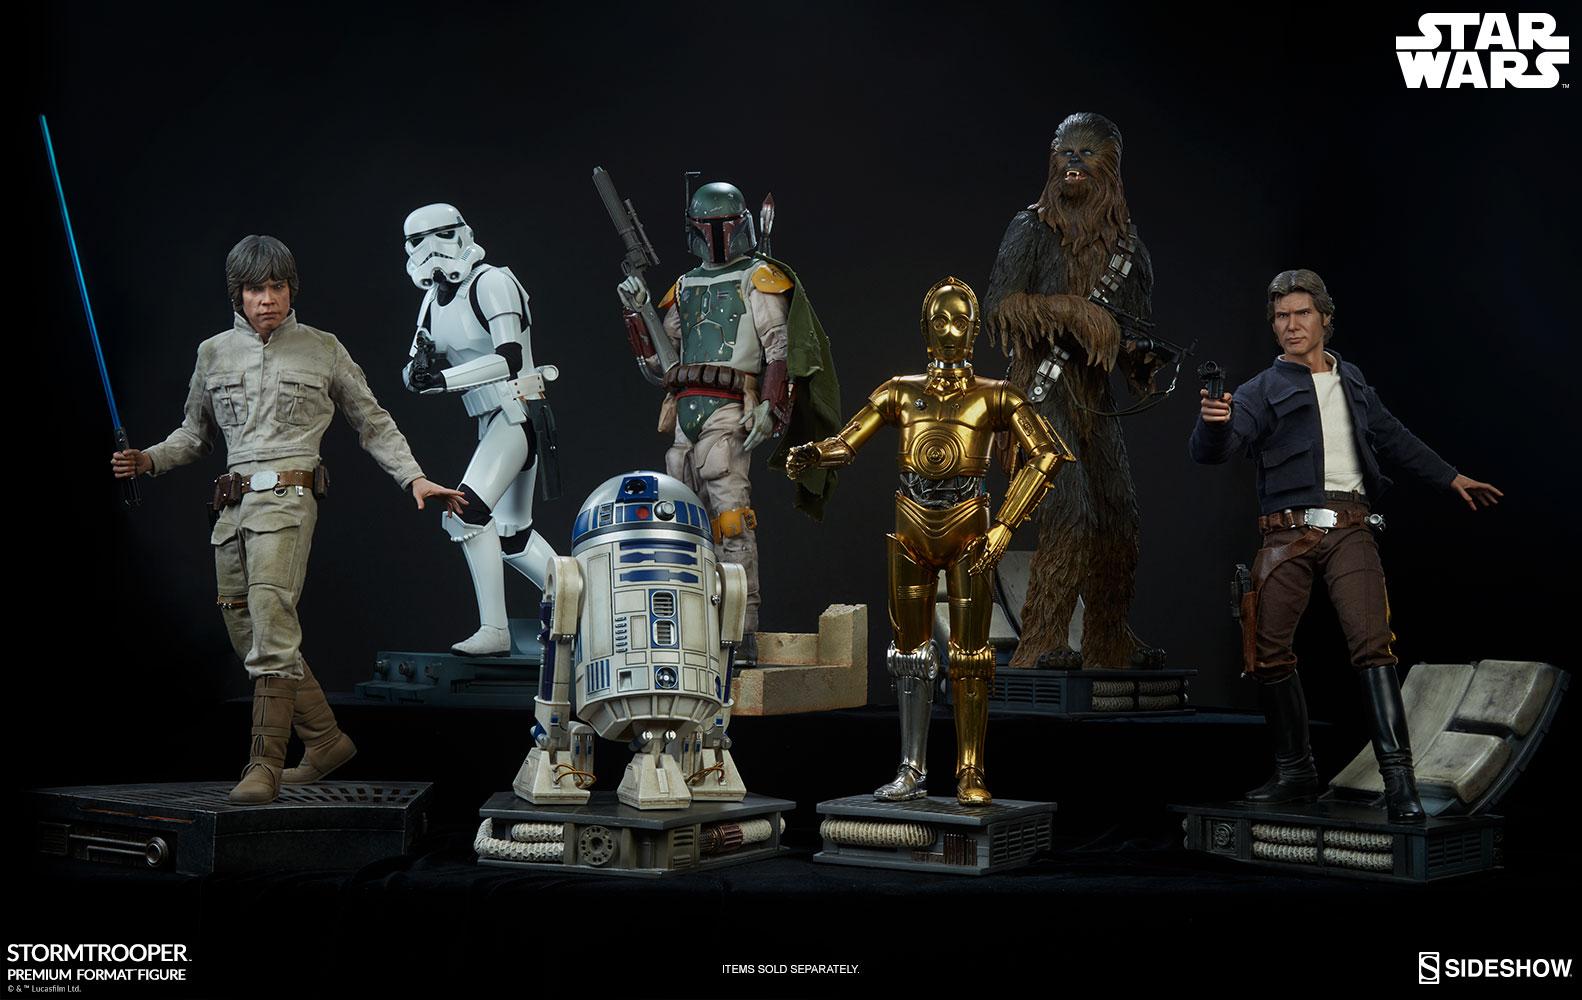 star-wars-stormtrooper-premium-format-figure-sideshow-300526-25